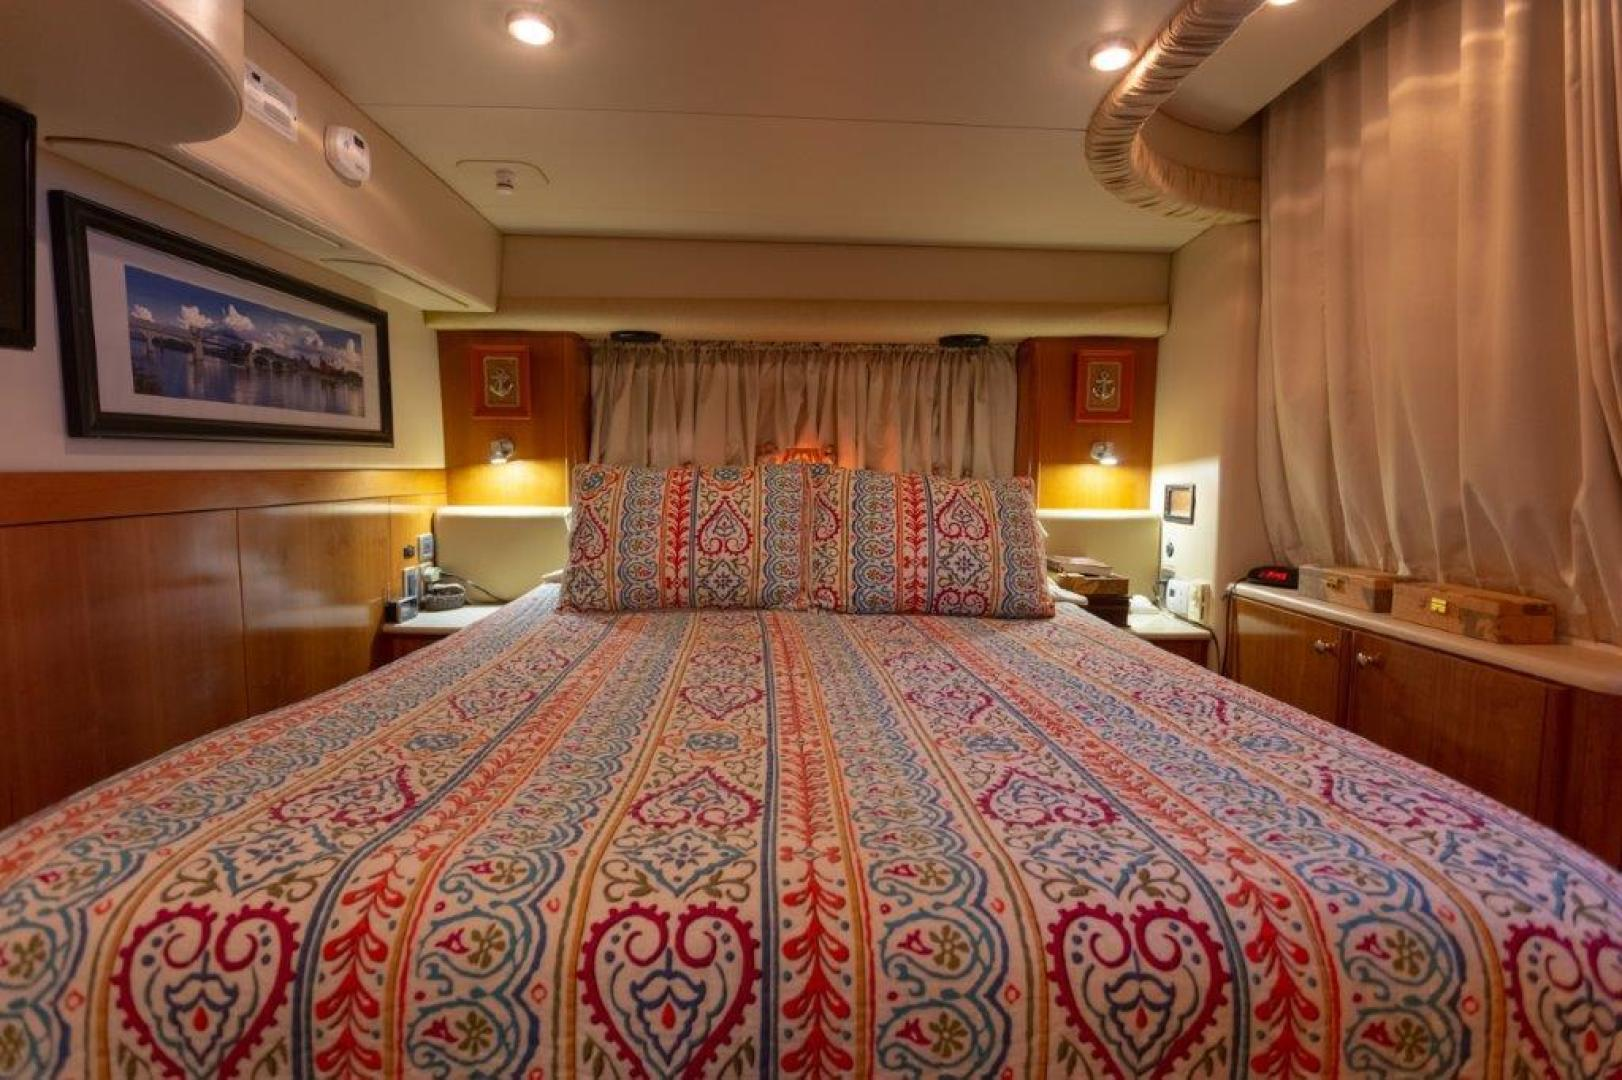 Meridian-459 Motoryacht 2004-Total Pleasure Chattanooga-Tennessee-United States-553084 | Thumbnail